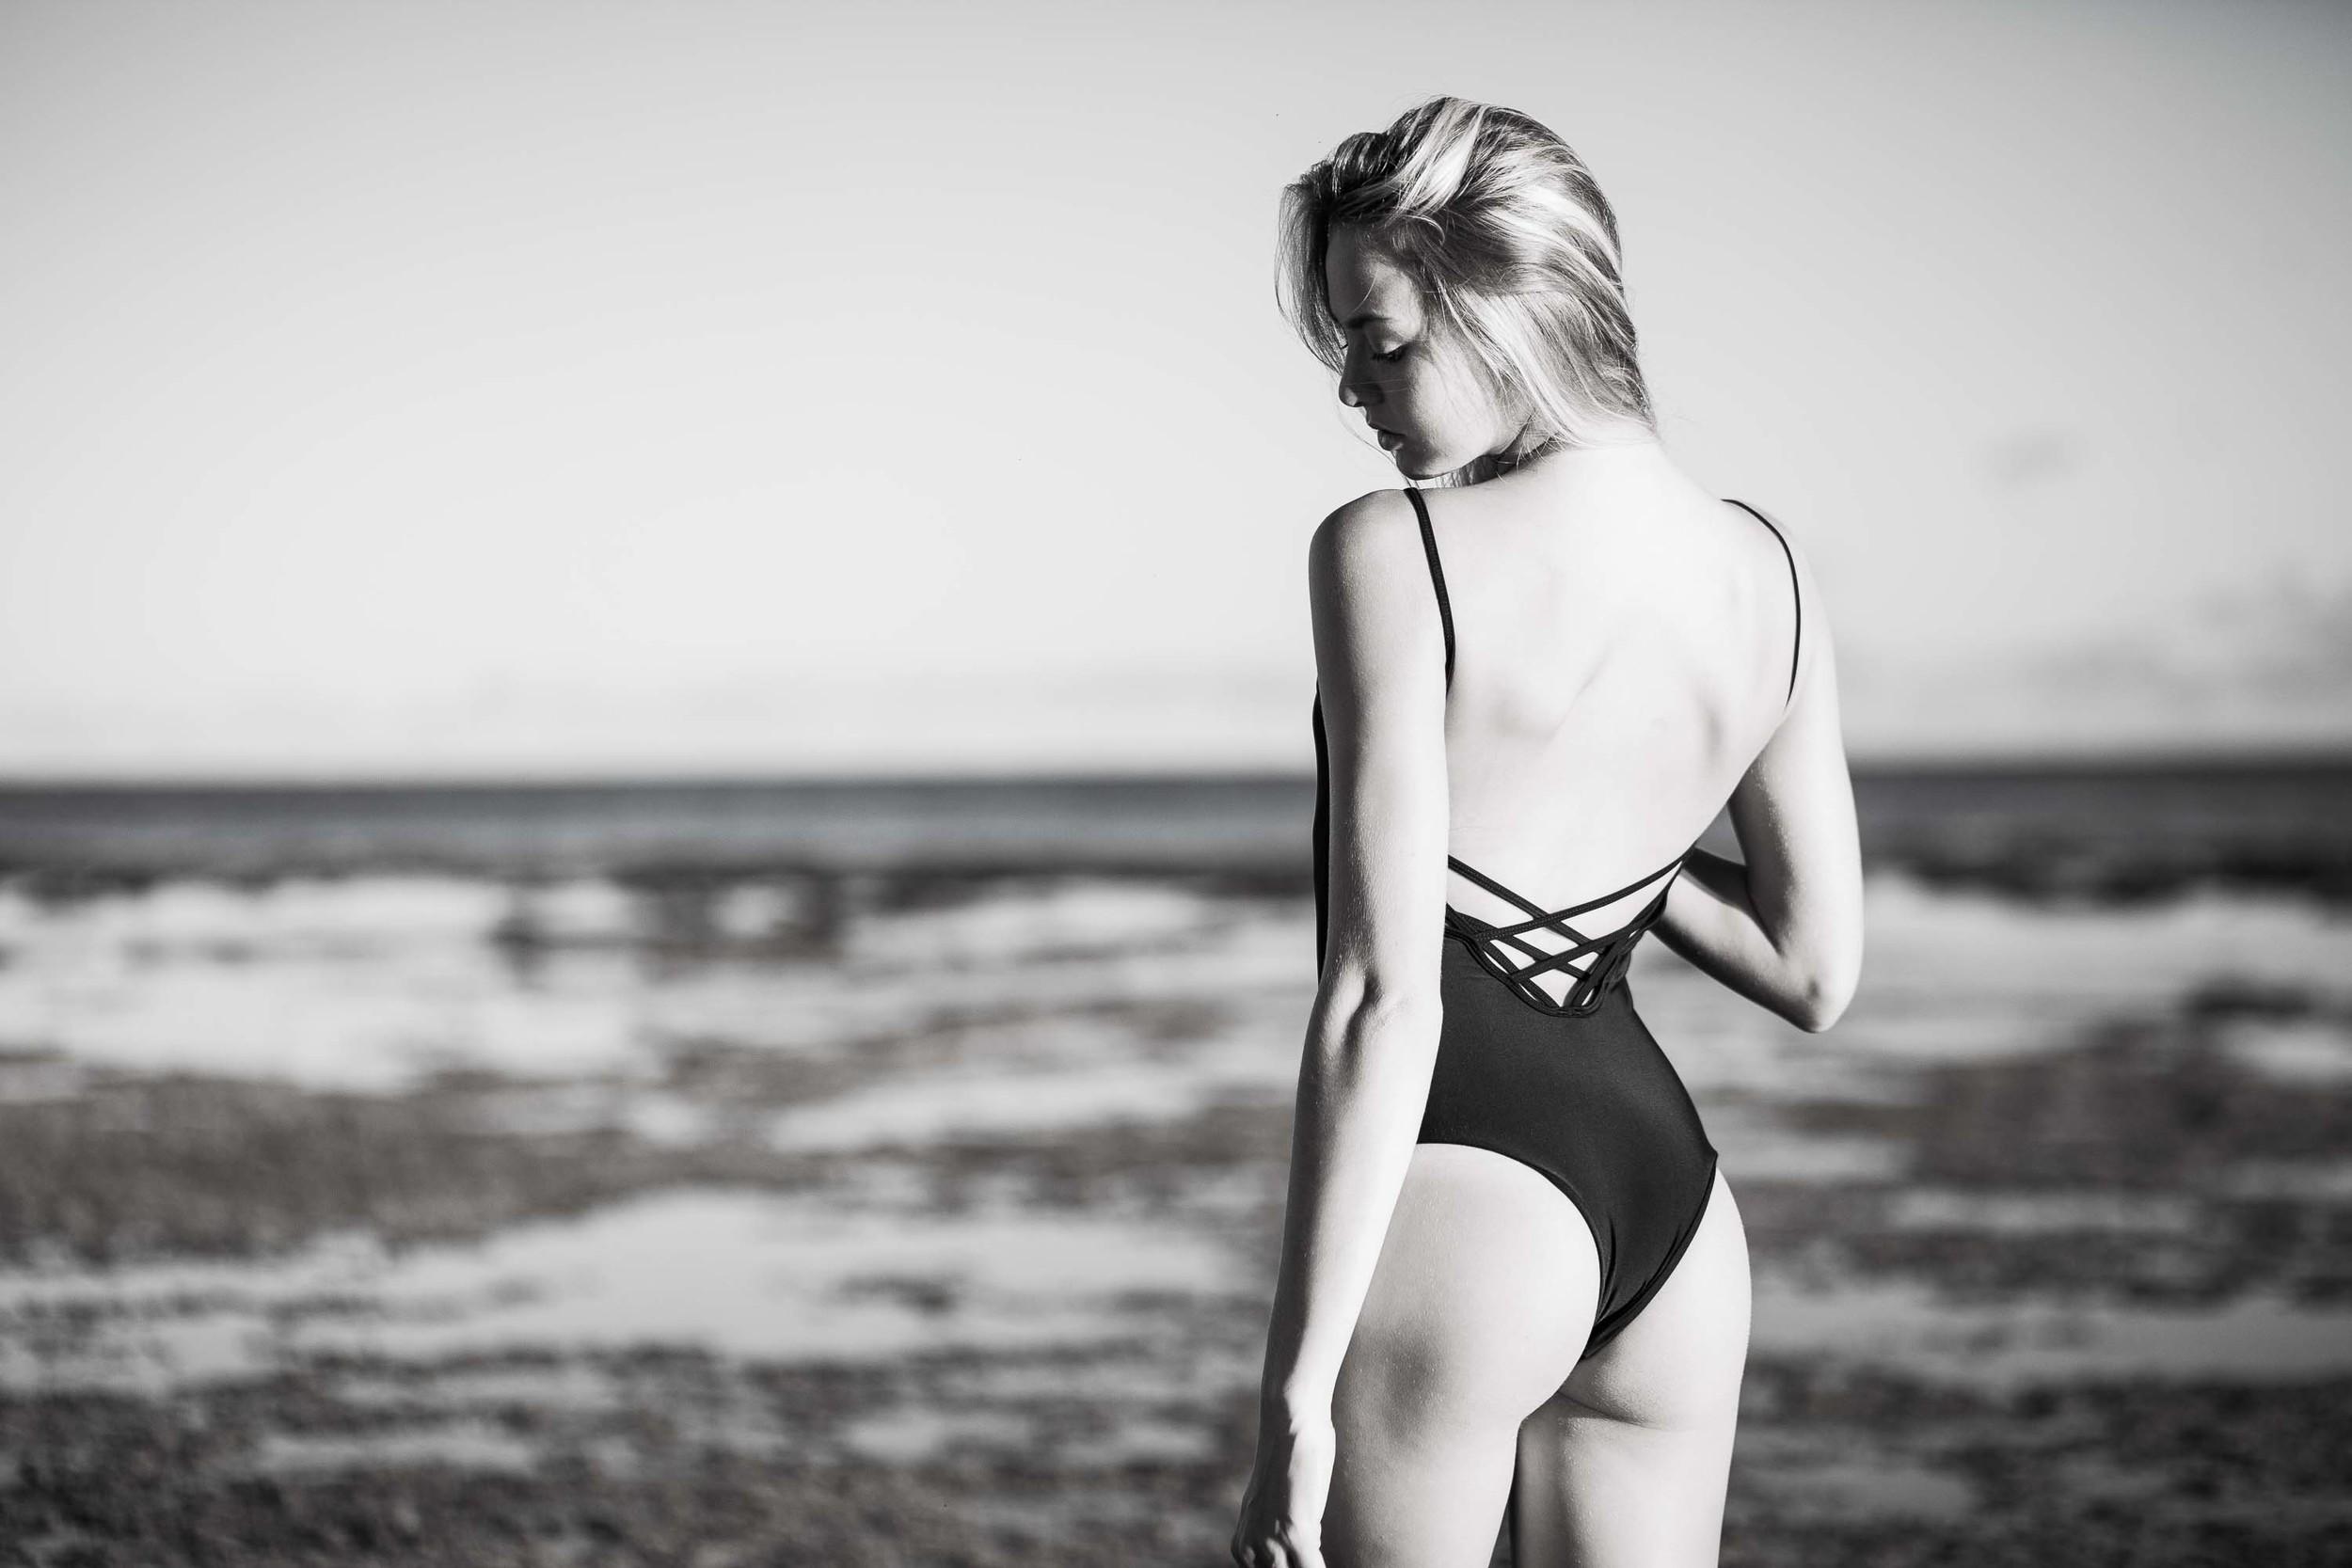 bryce-johnson-issademar-swimwear-gabby harrington-2.jpg